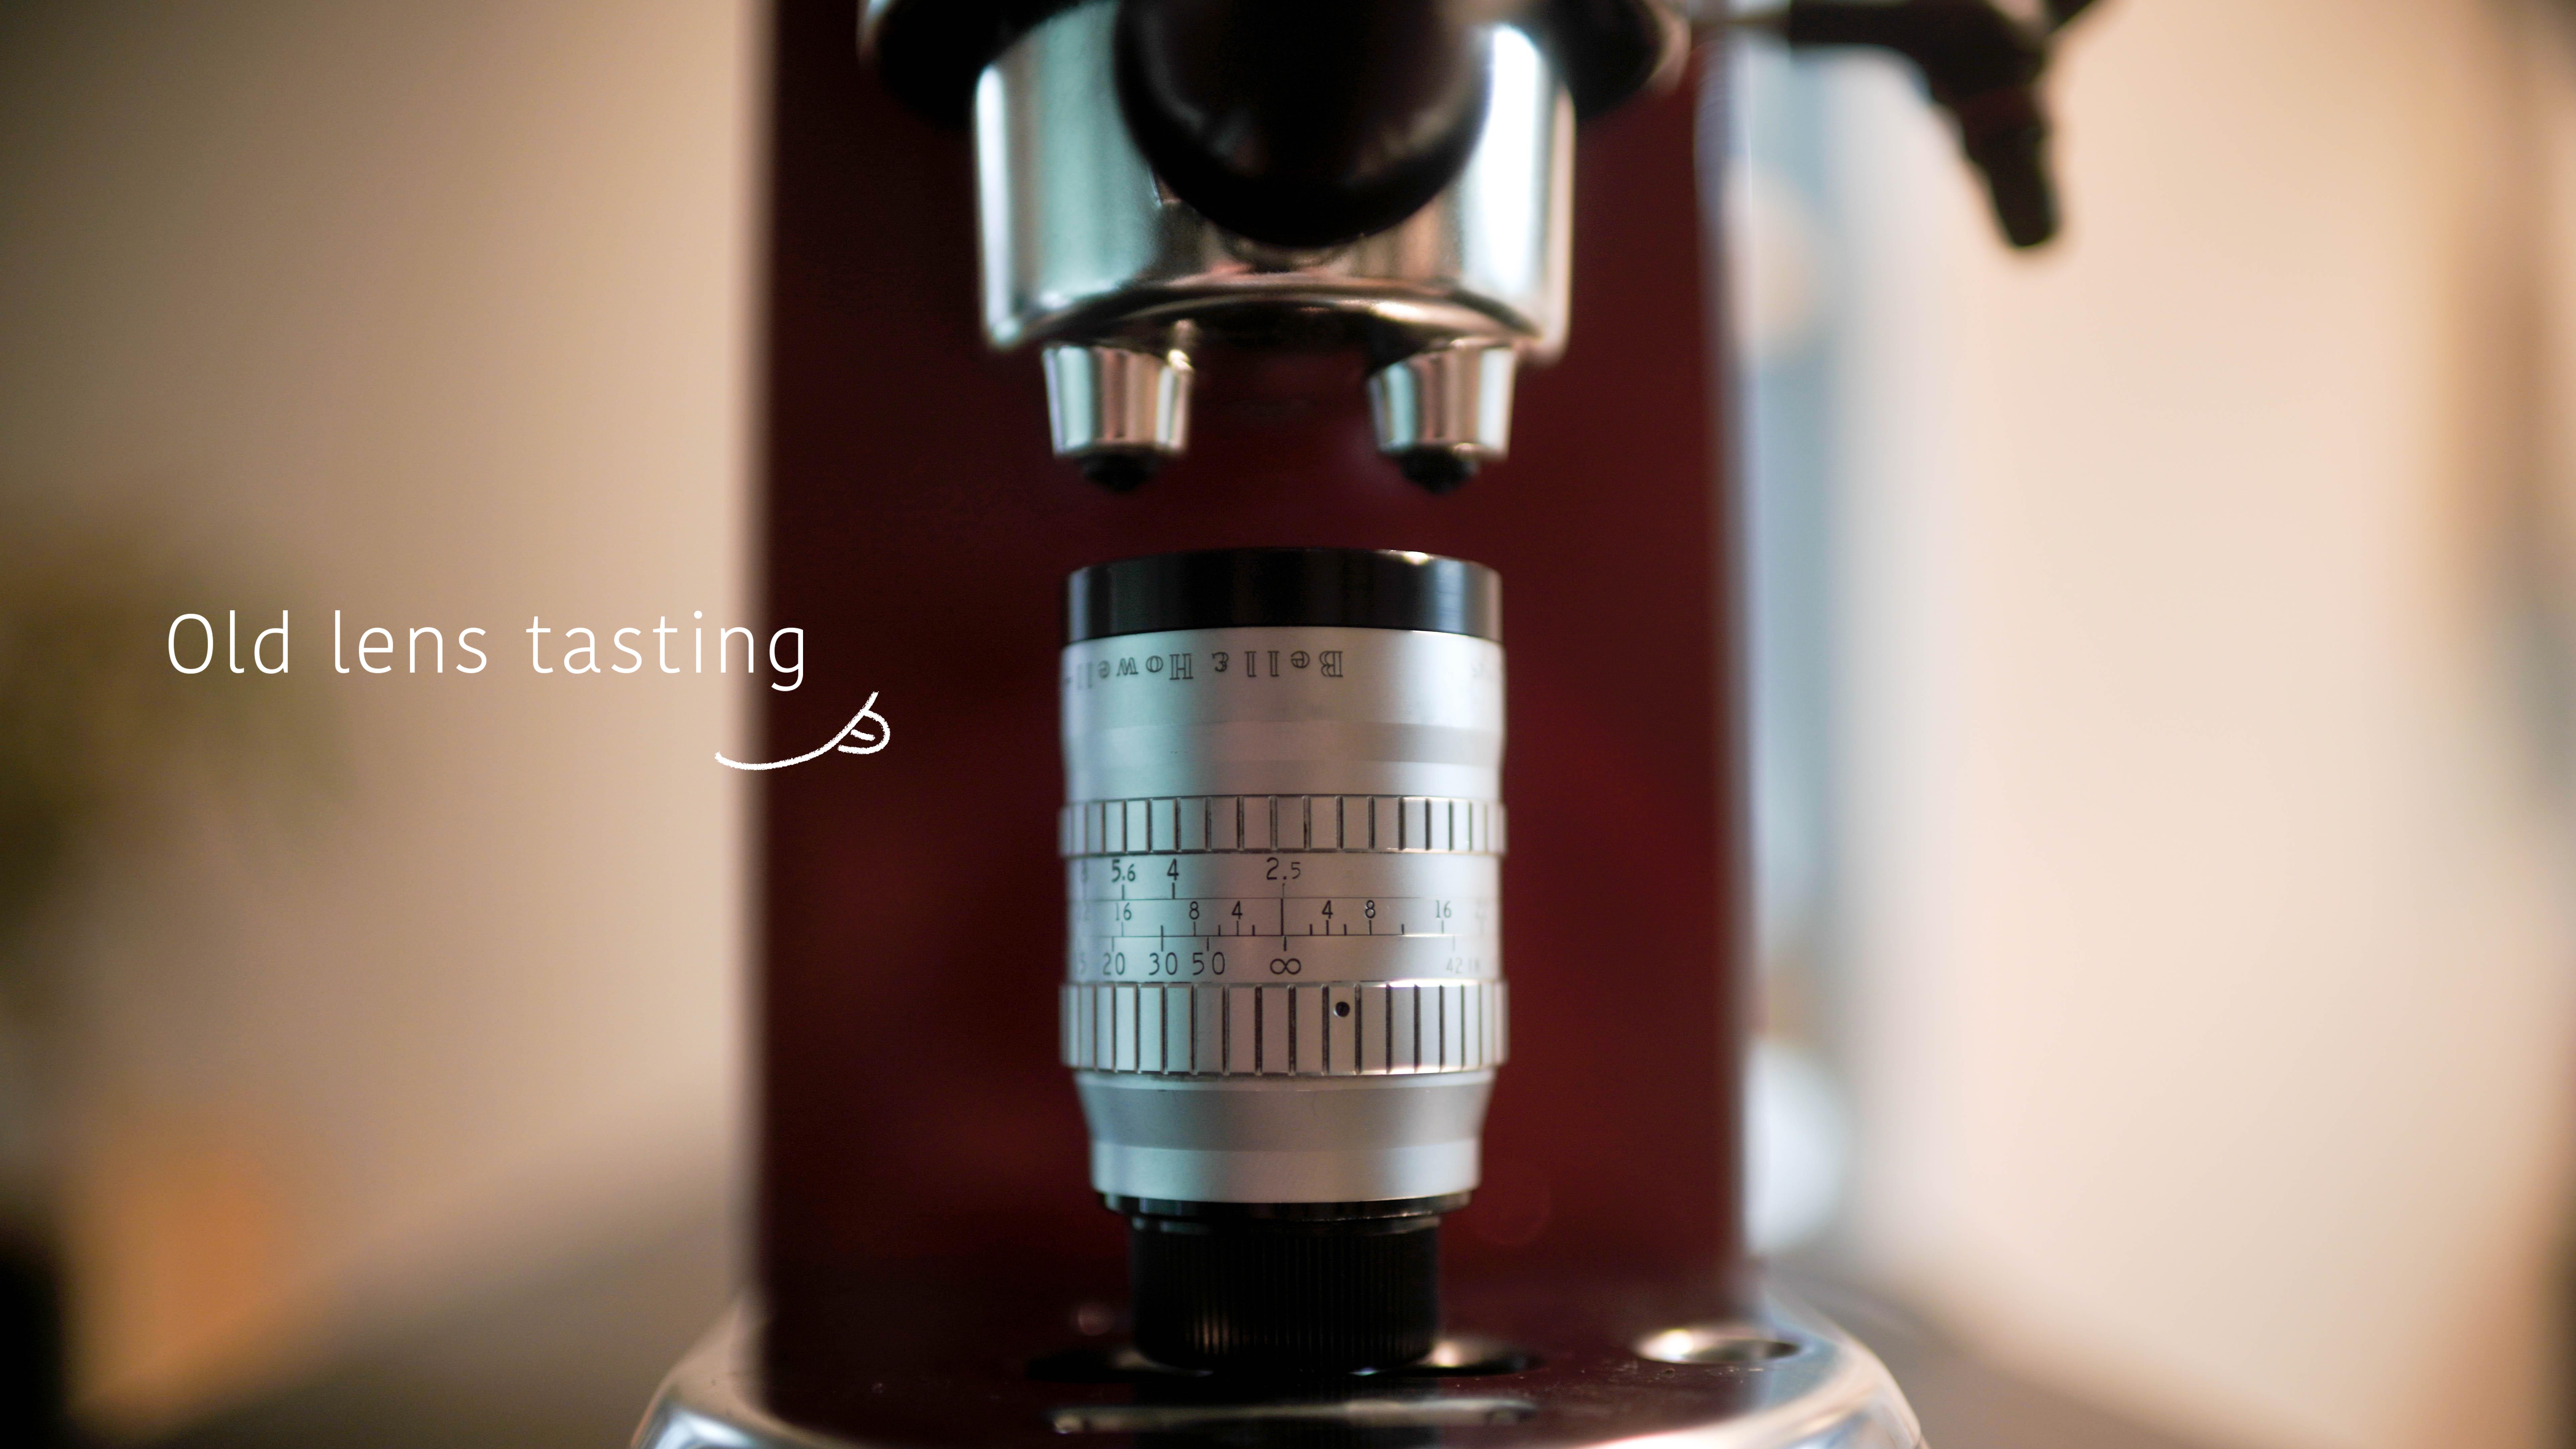 【etc.】Lens tasting 3 P.Angenieux 3inch F2.5